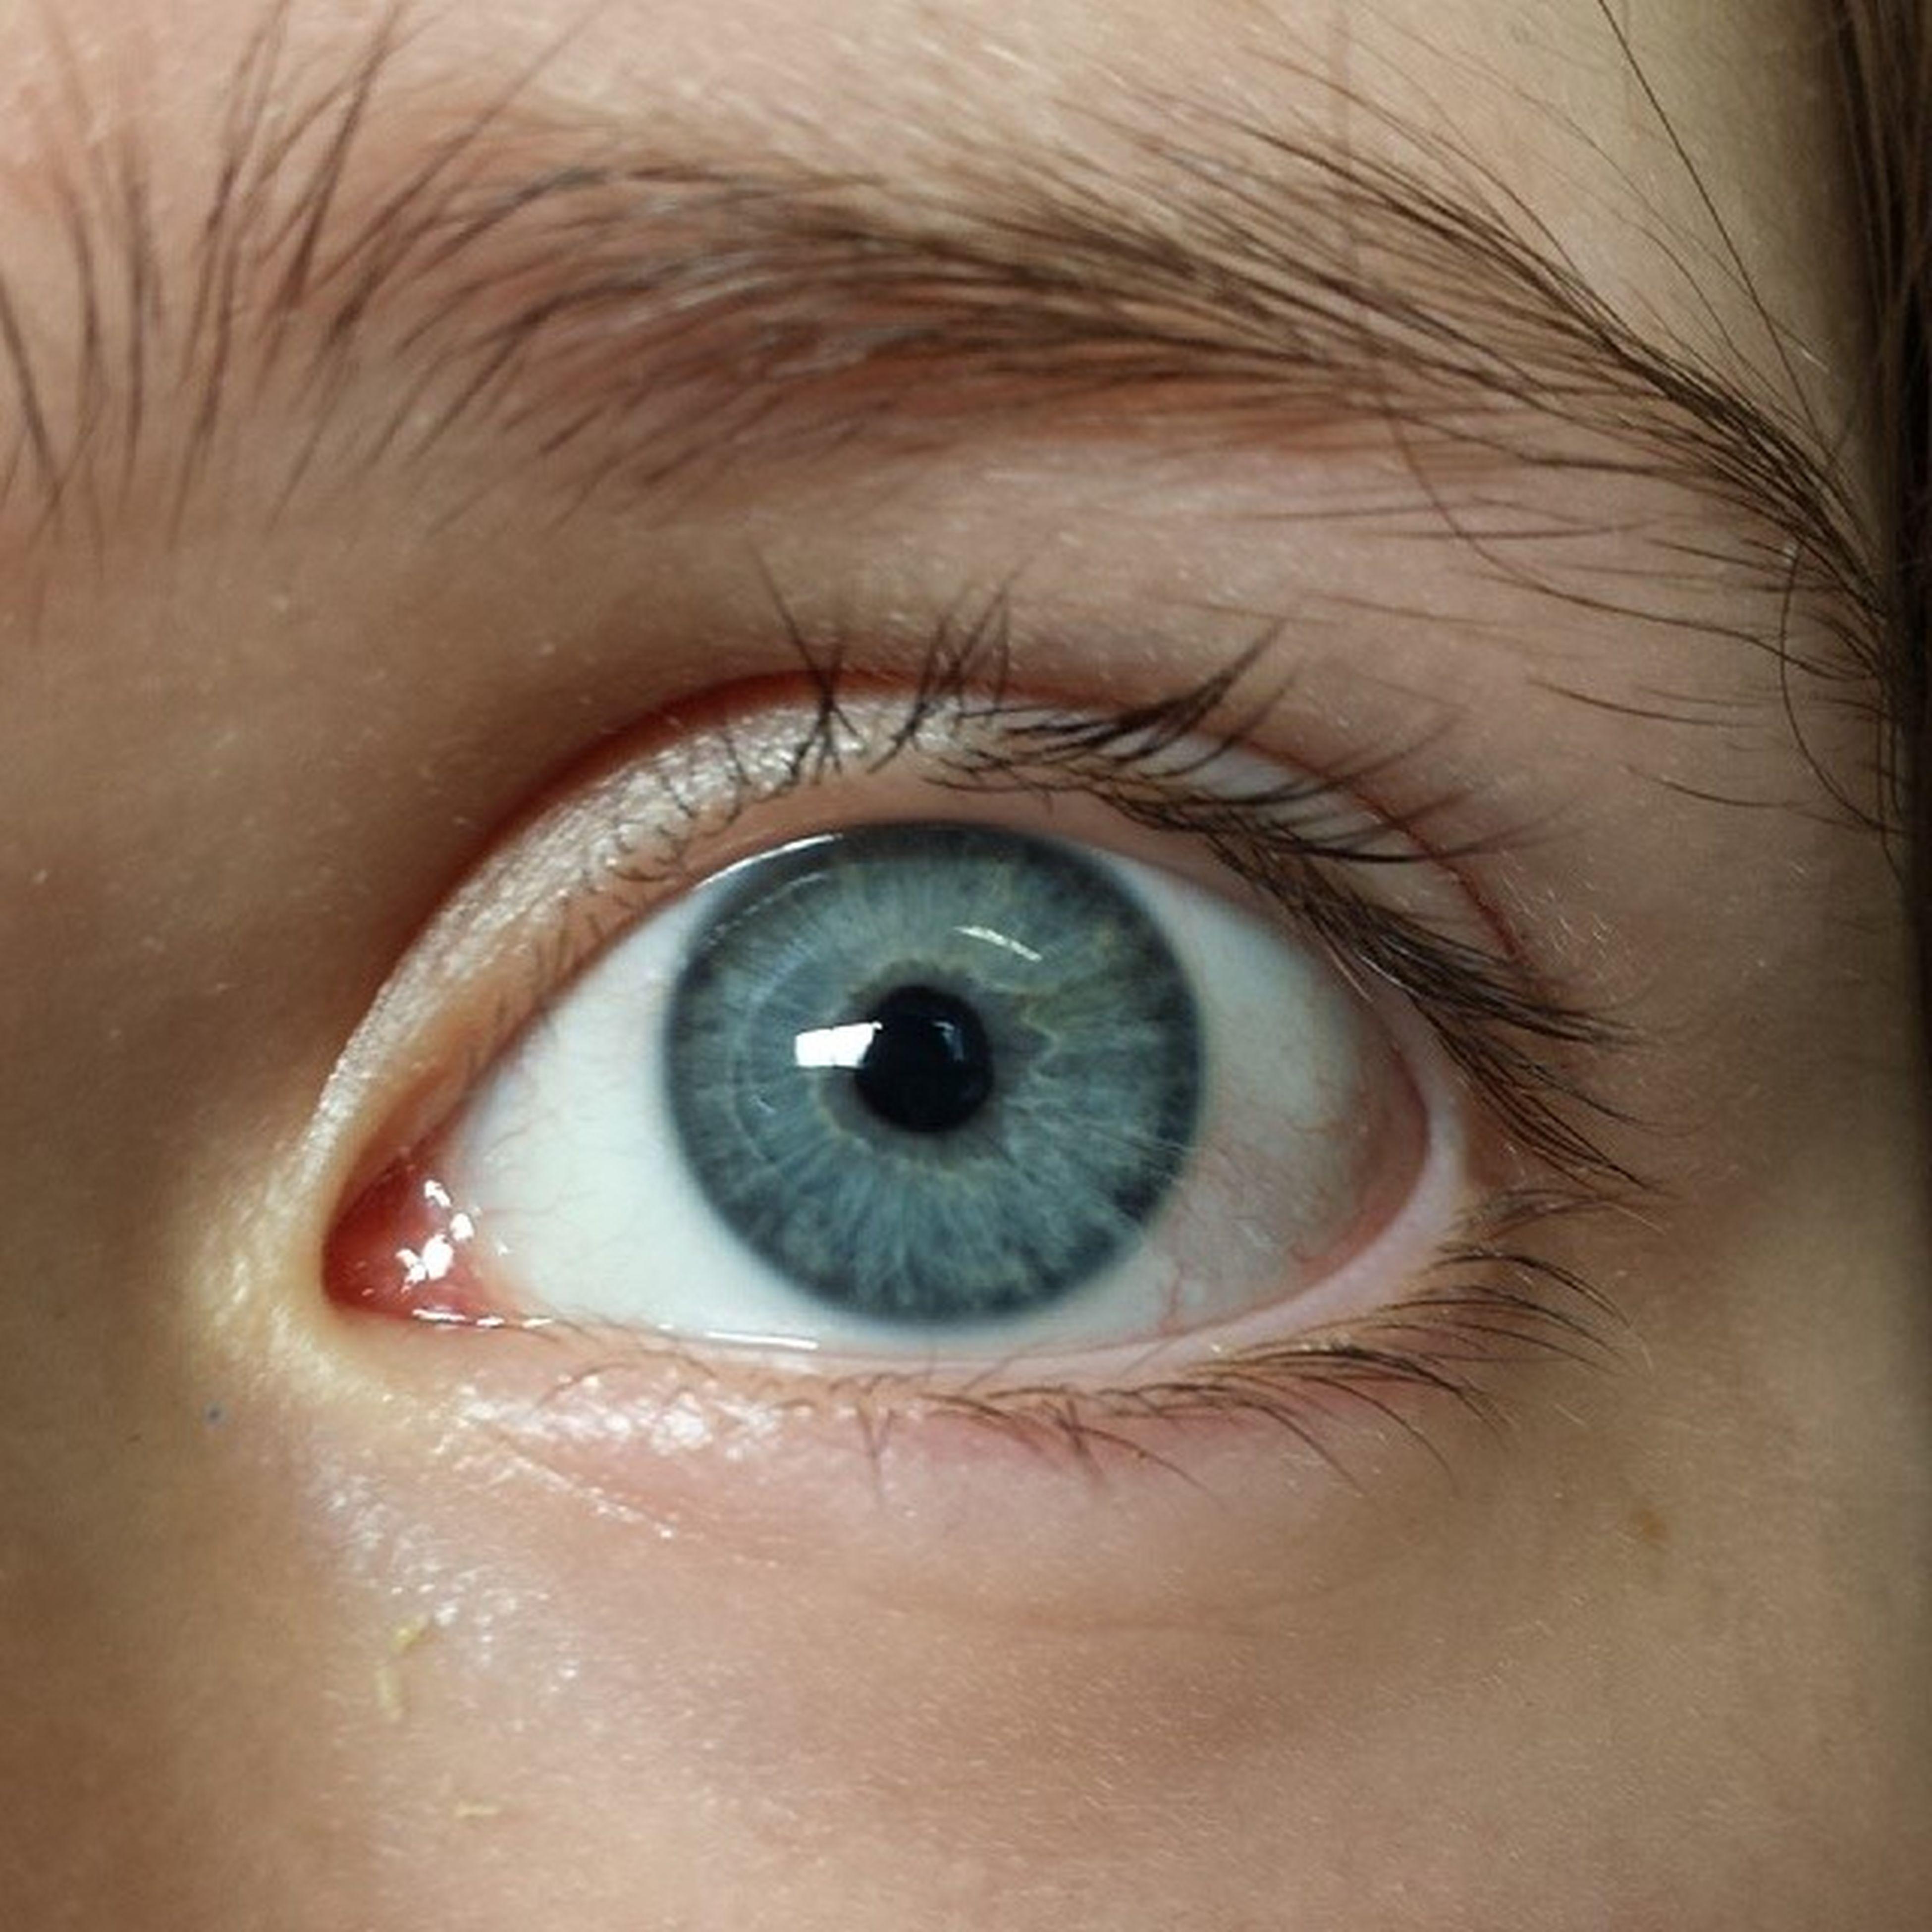 human eye, eyelash, eyesight, close-up, sensory perception, part of, extreme close-up, iris - eye, eyeball, human skin, looking at camera, full frame, portrait, extreme close up, eyebrow, person, vision